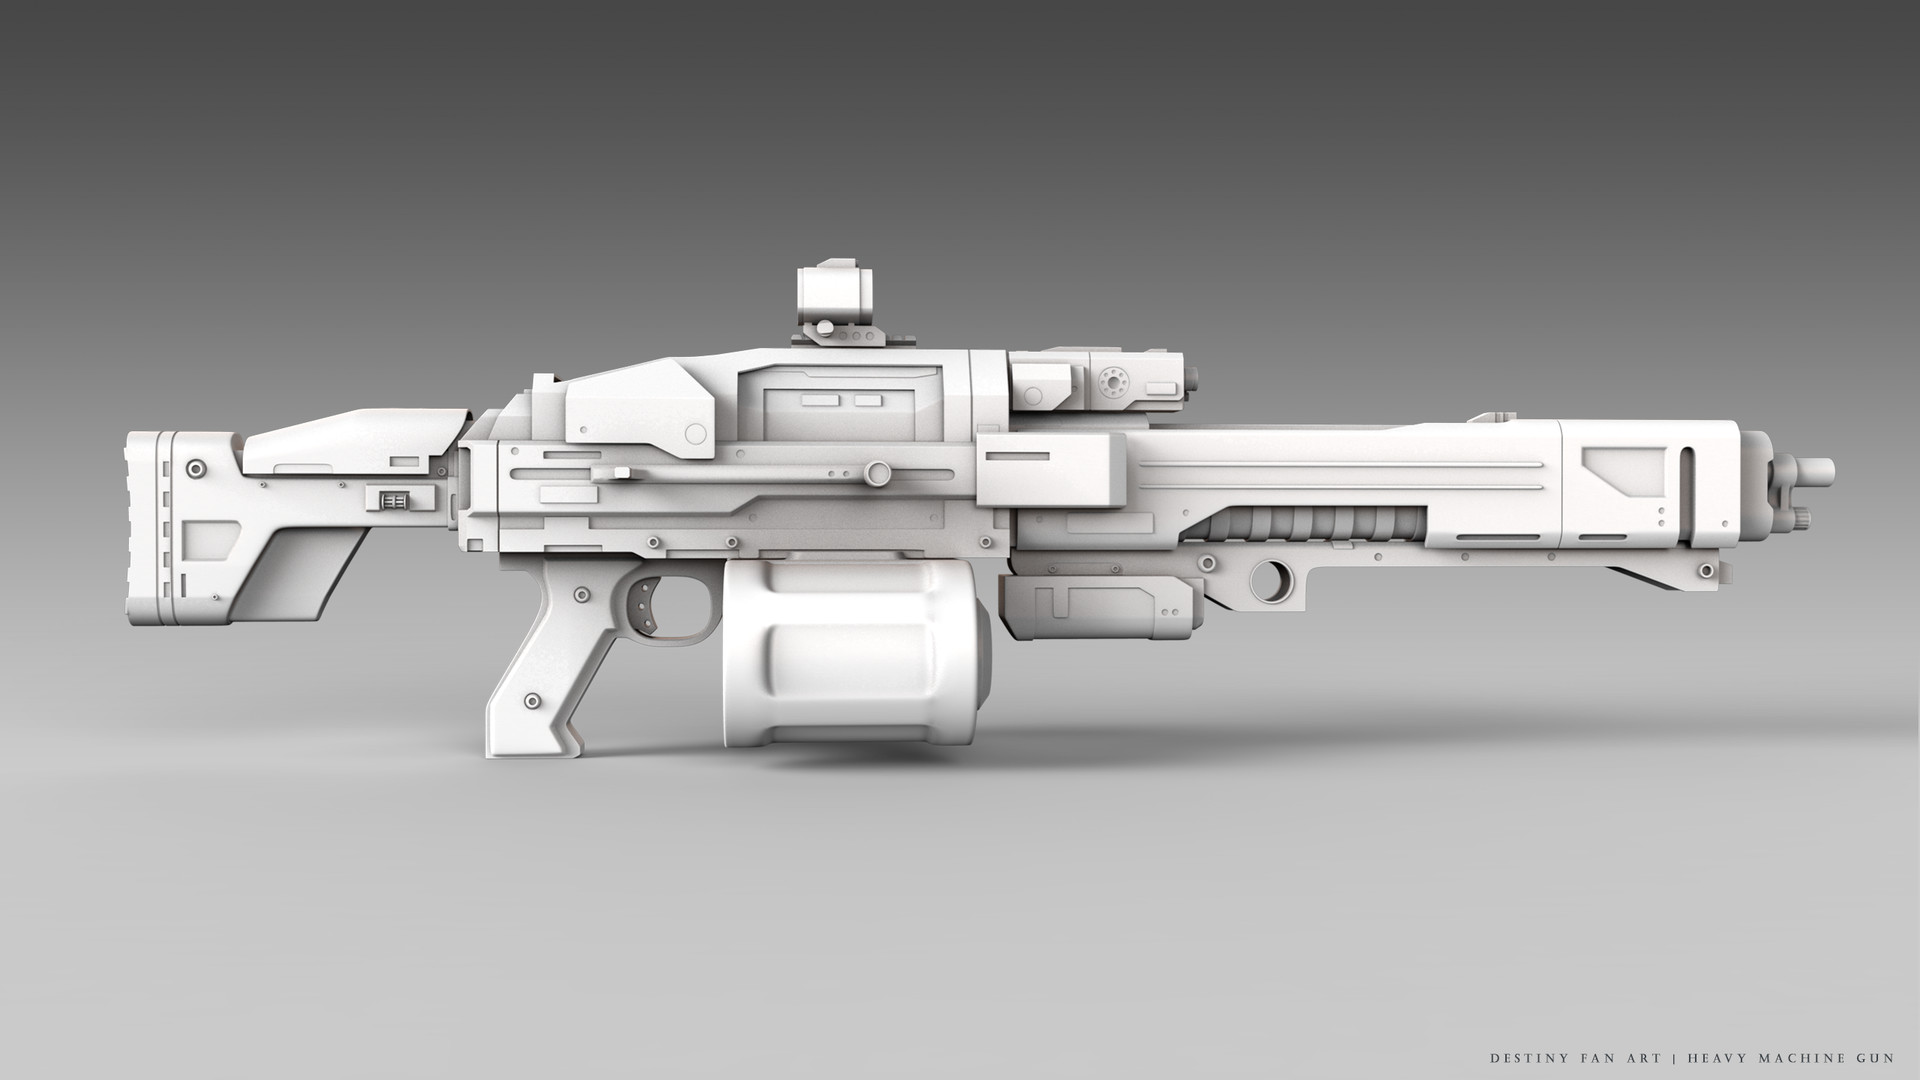 develop heavy machine guns - HD1920×1080